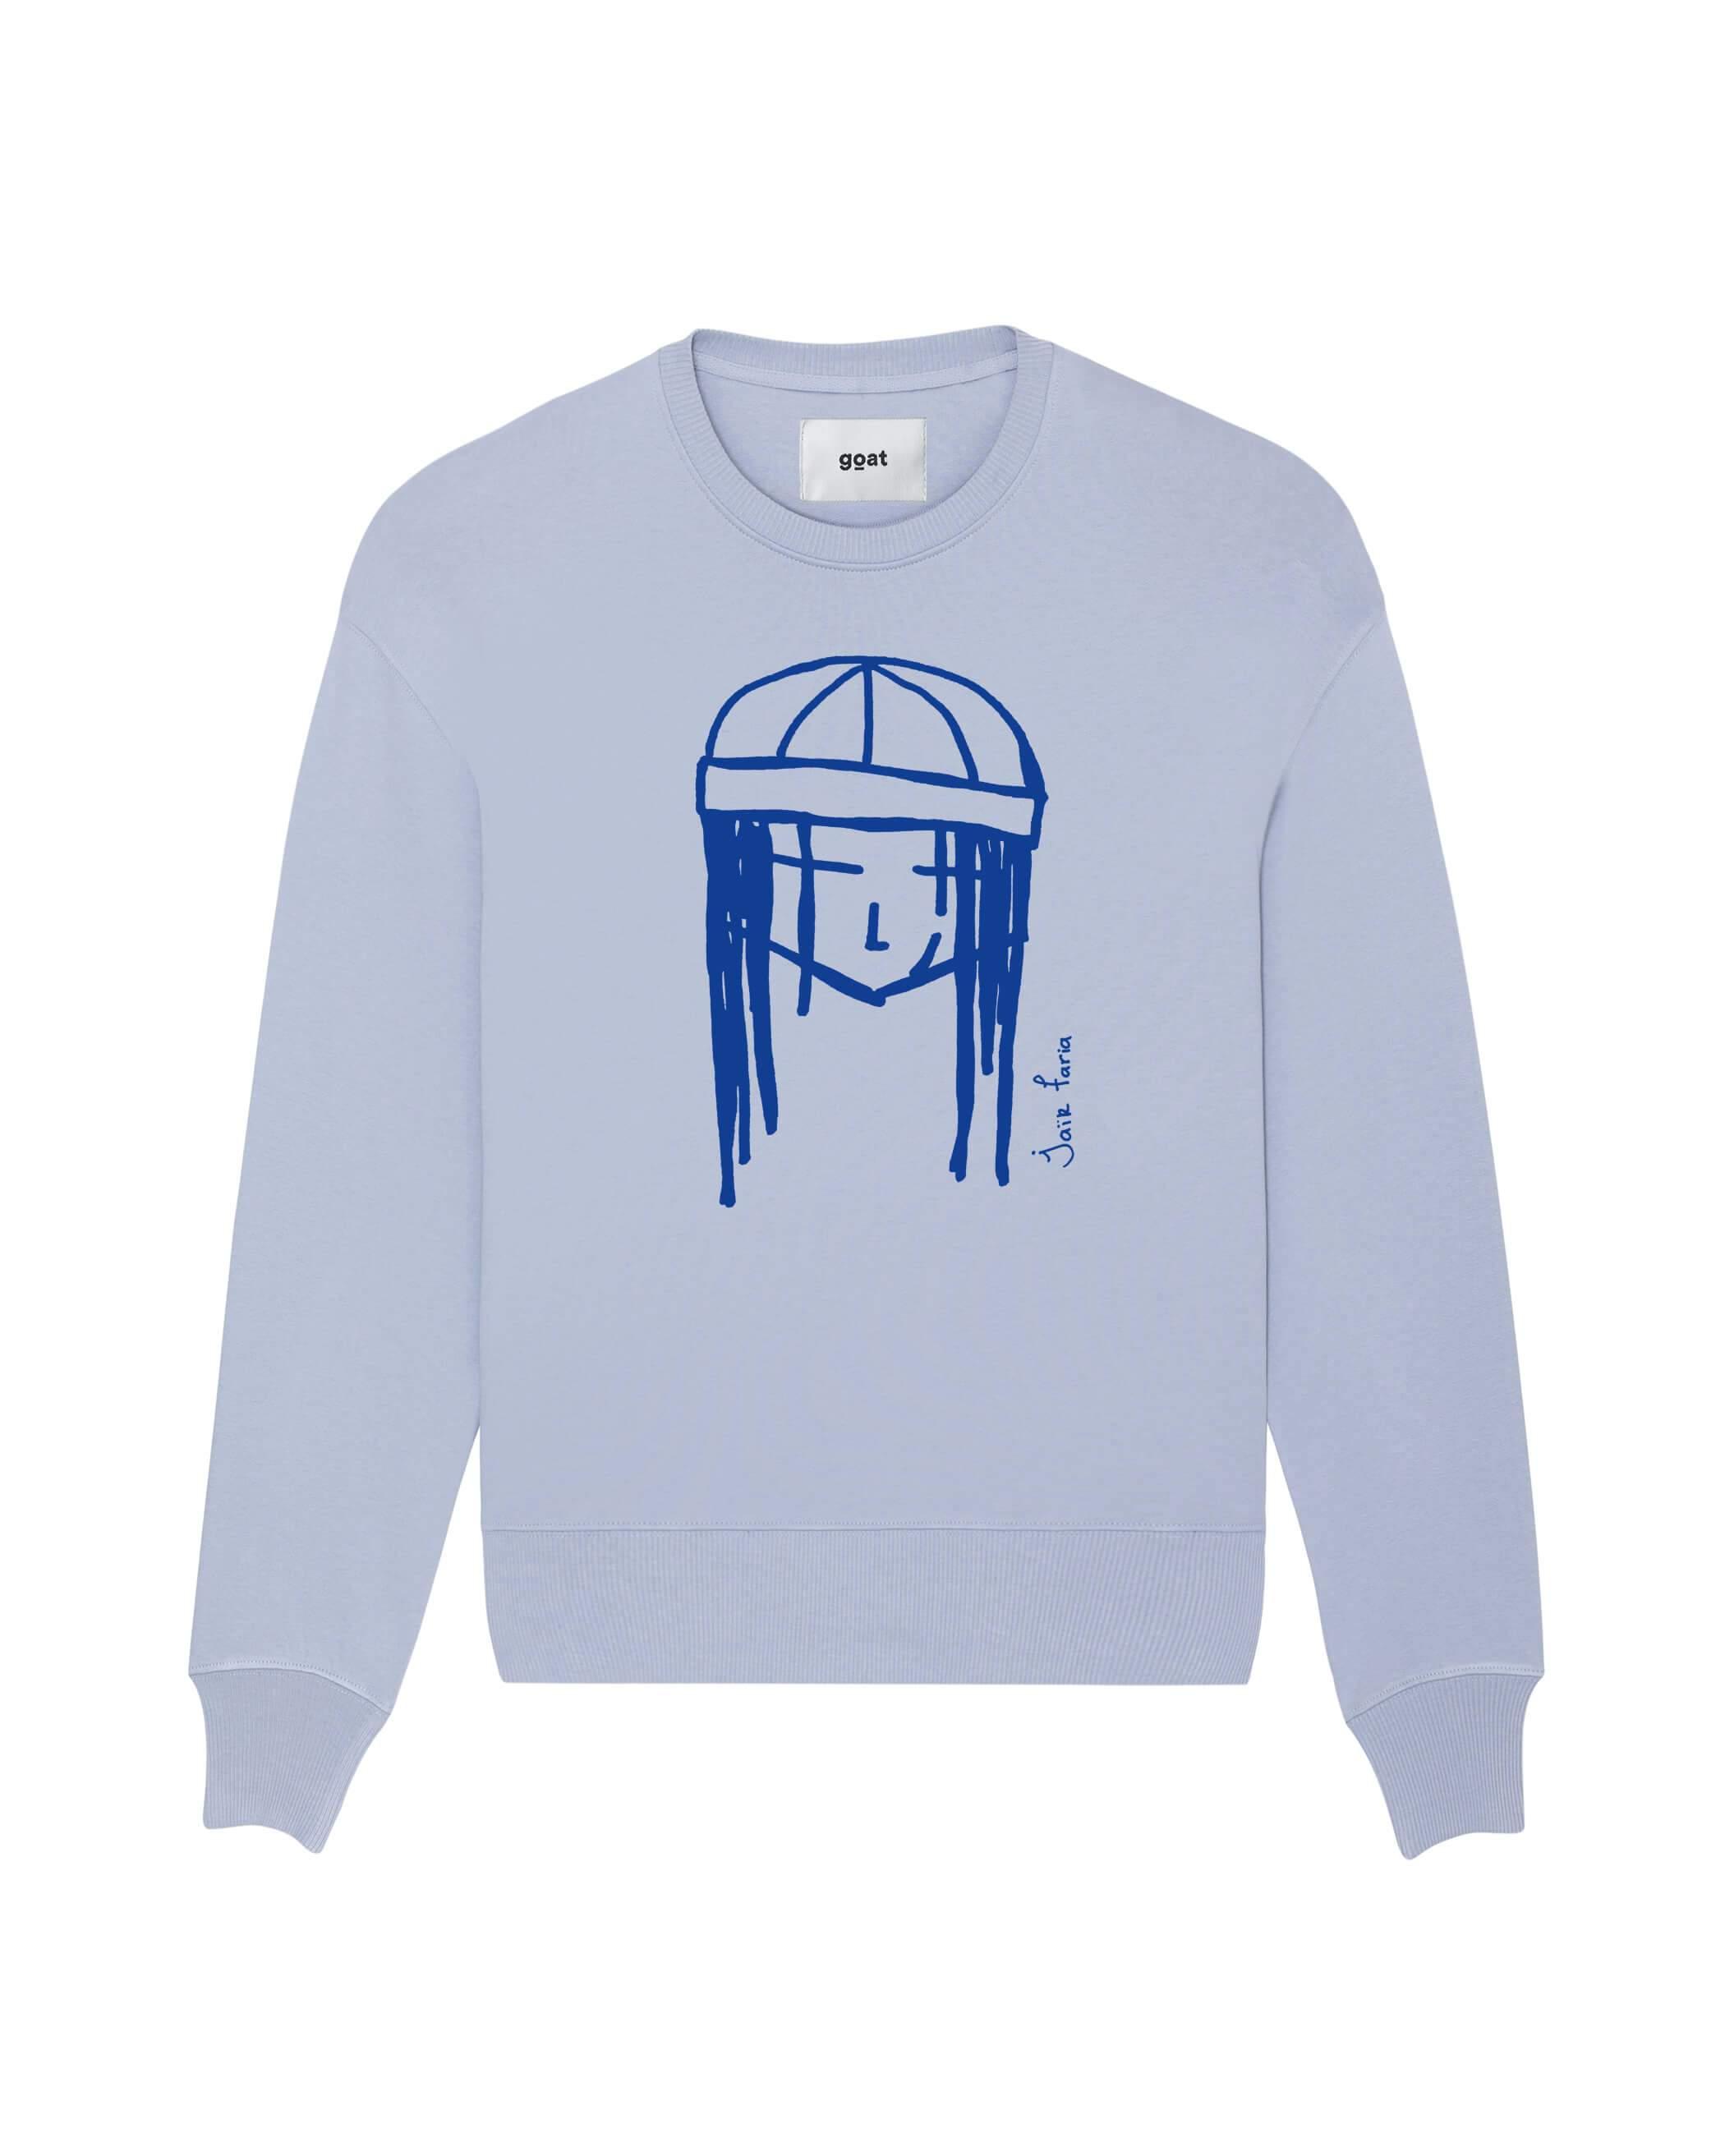 Jaïr 1.0 Sweater Light Blue